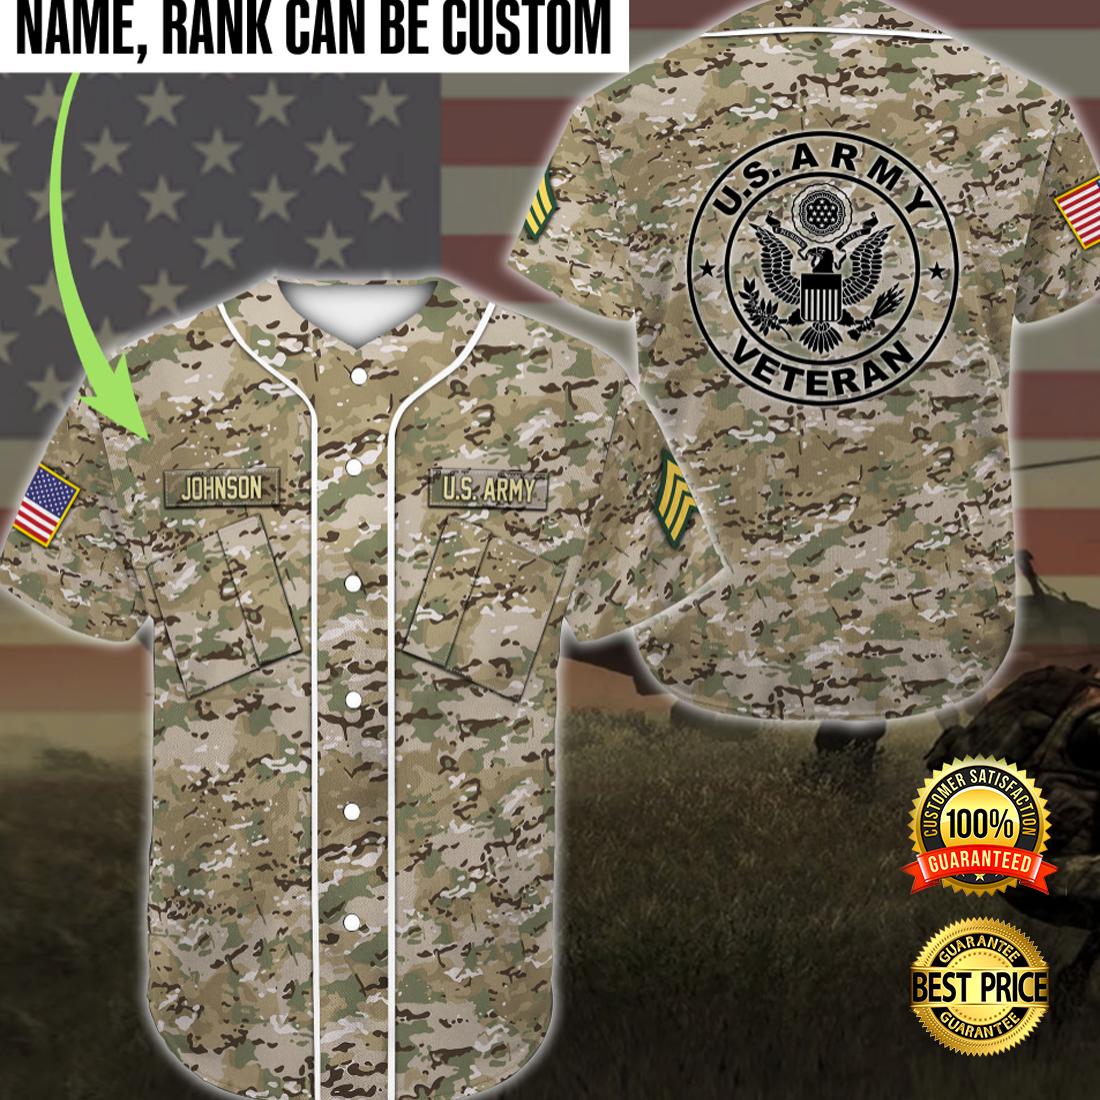 US ARMY VETERAN CAMO BASEBALL JERSEY 4